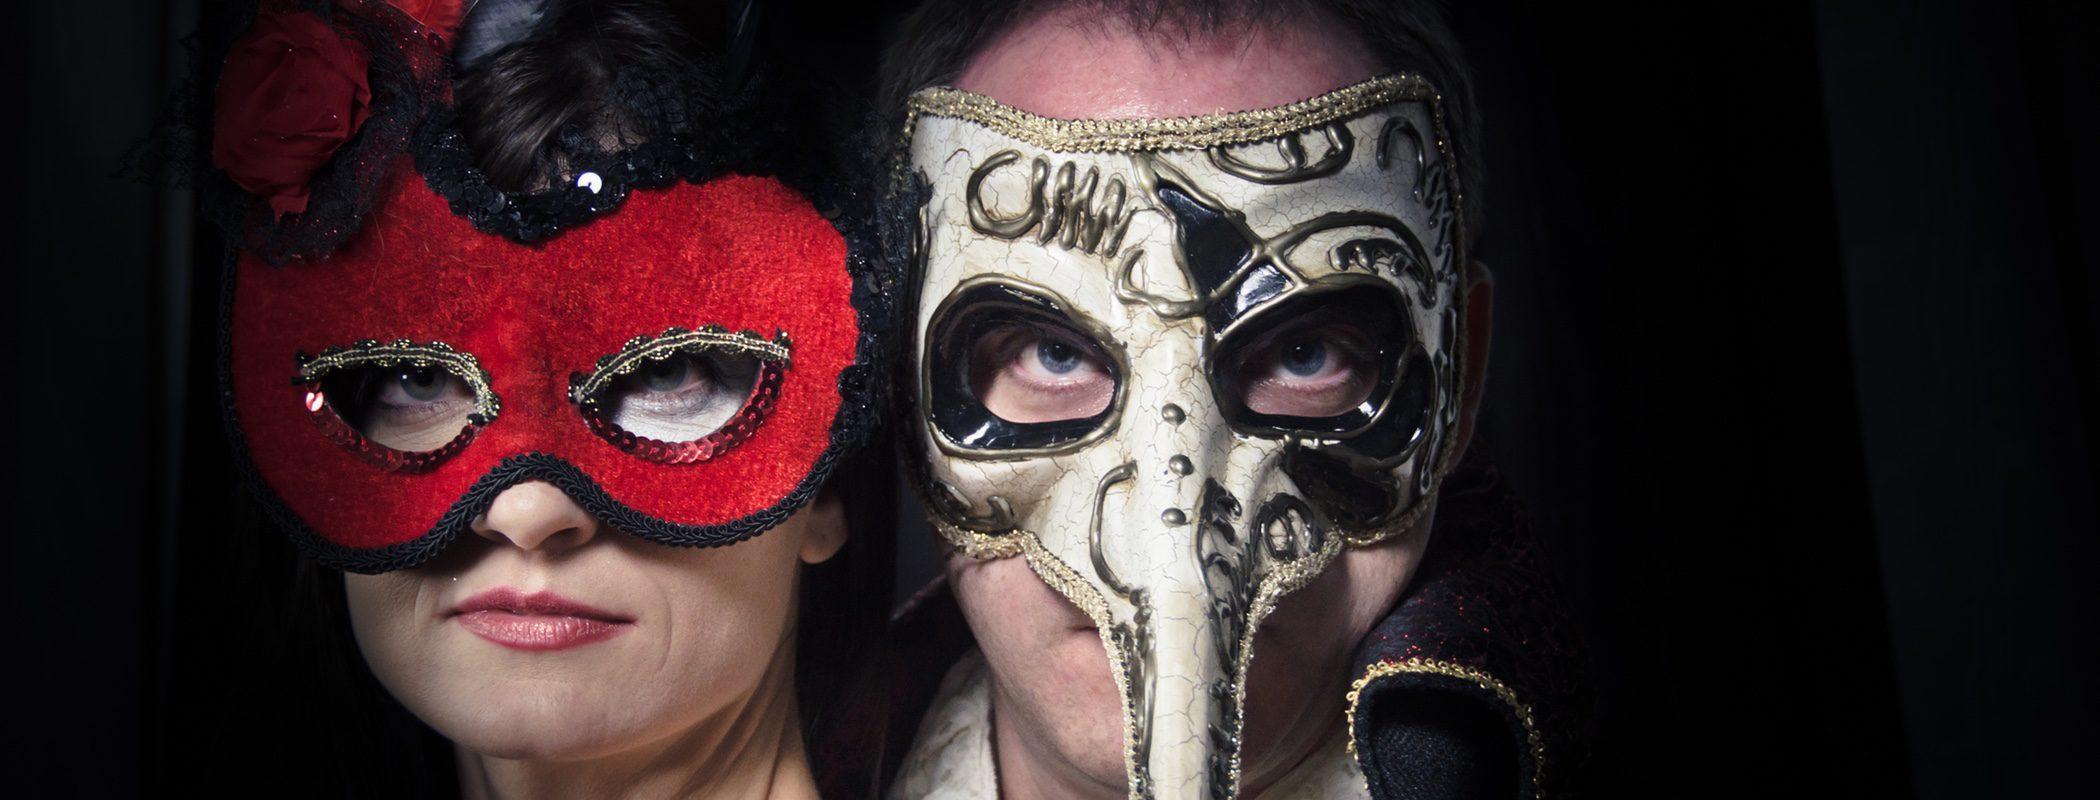 5 ideas para Carnaval para disfrazarte con tu pareja